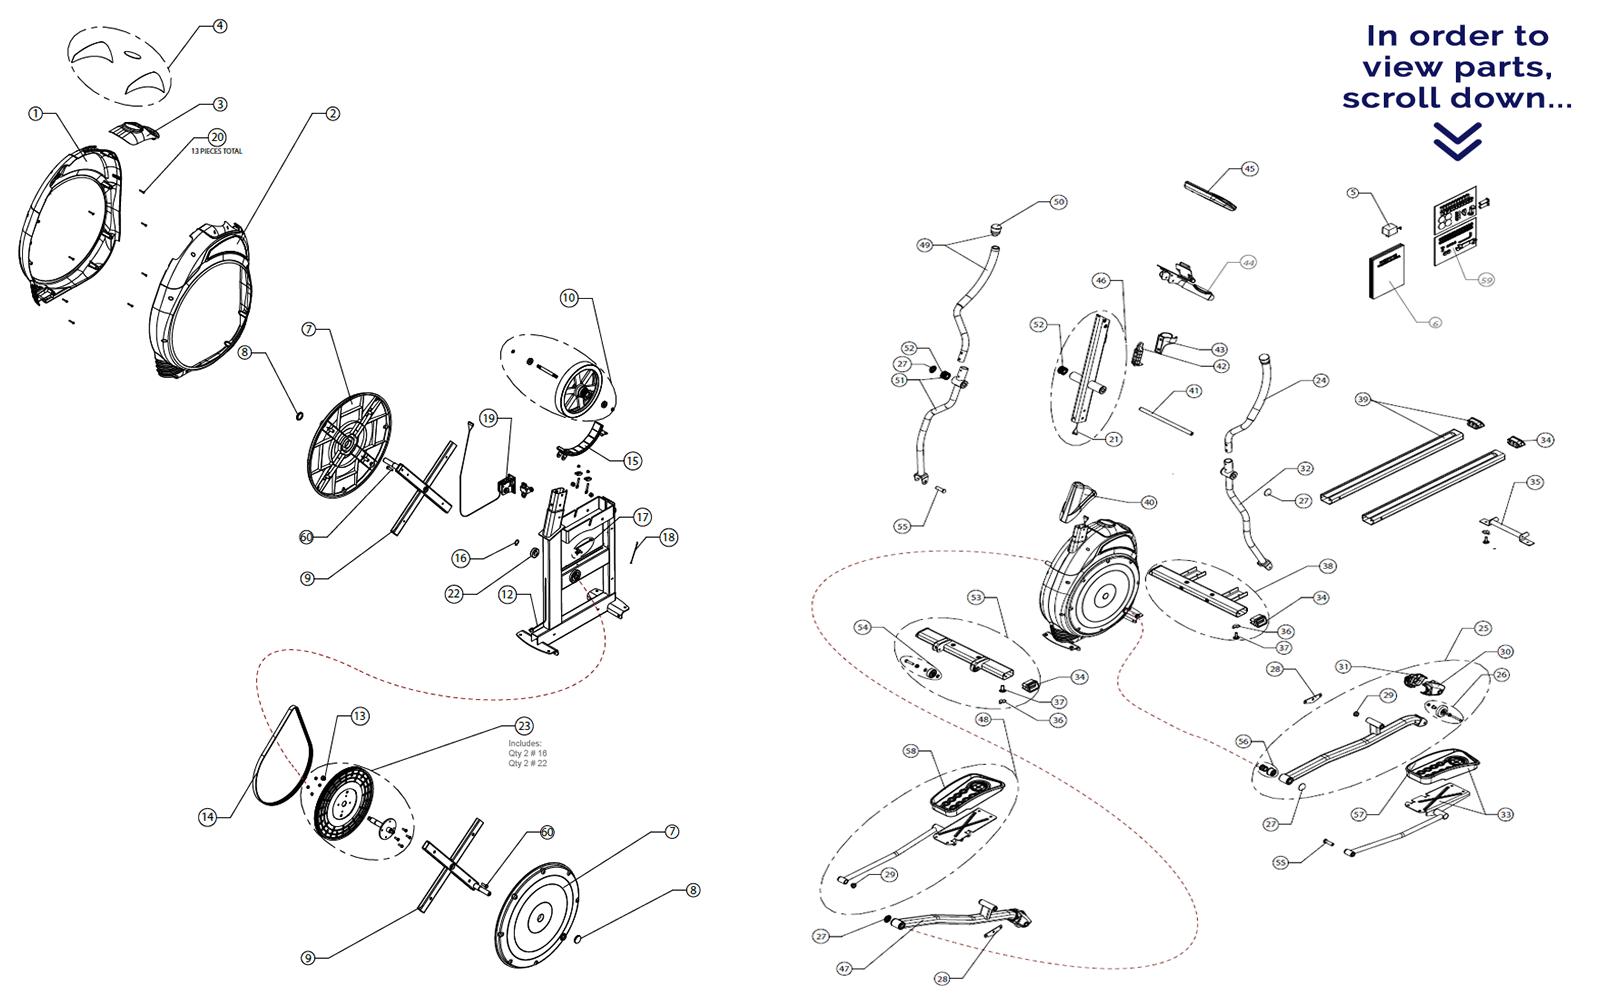 Schwinn 420 Elliptical Parts Scroll Down To View Parts